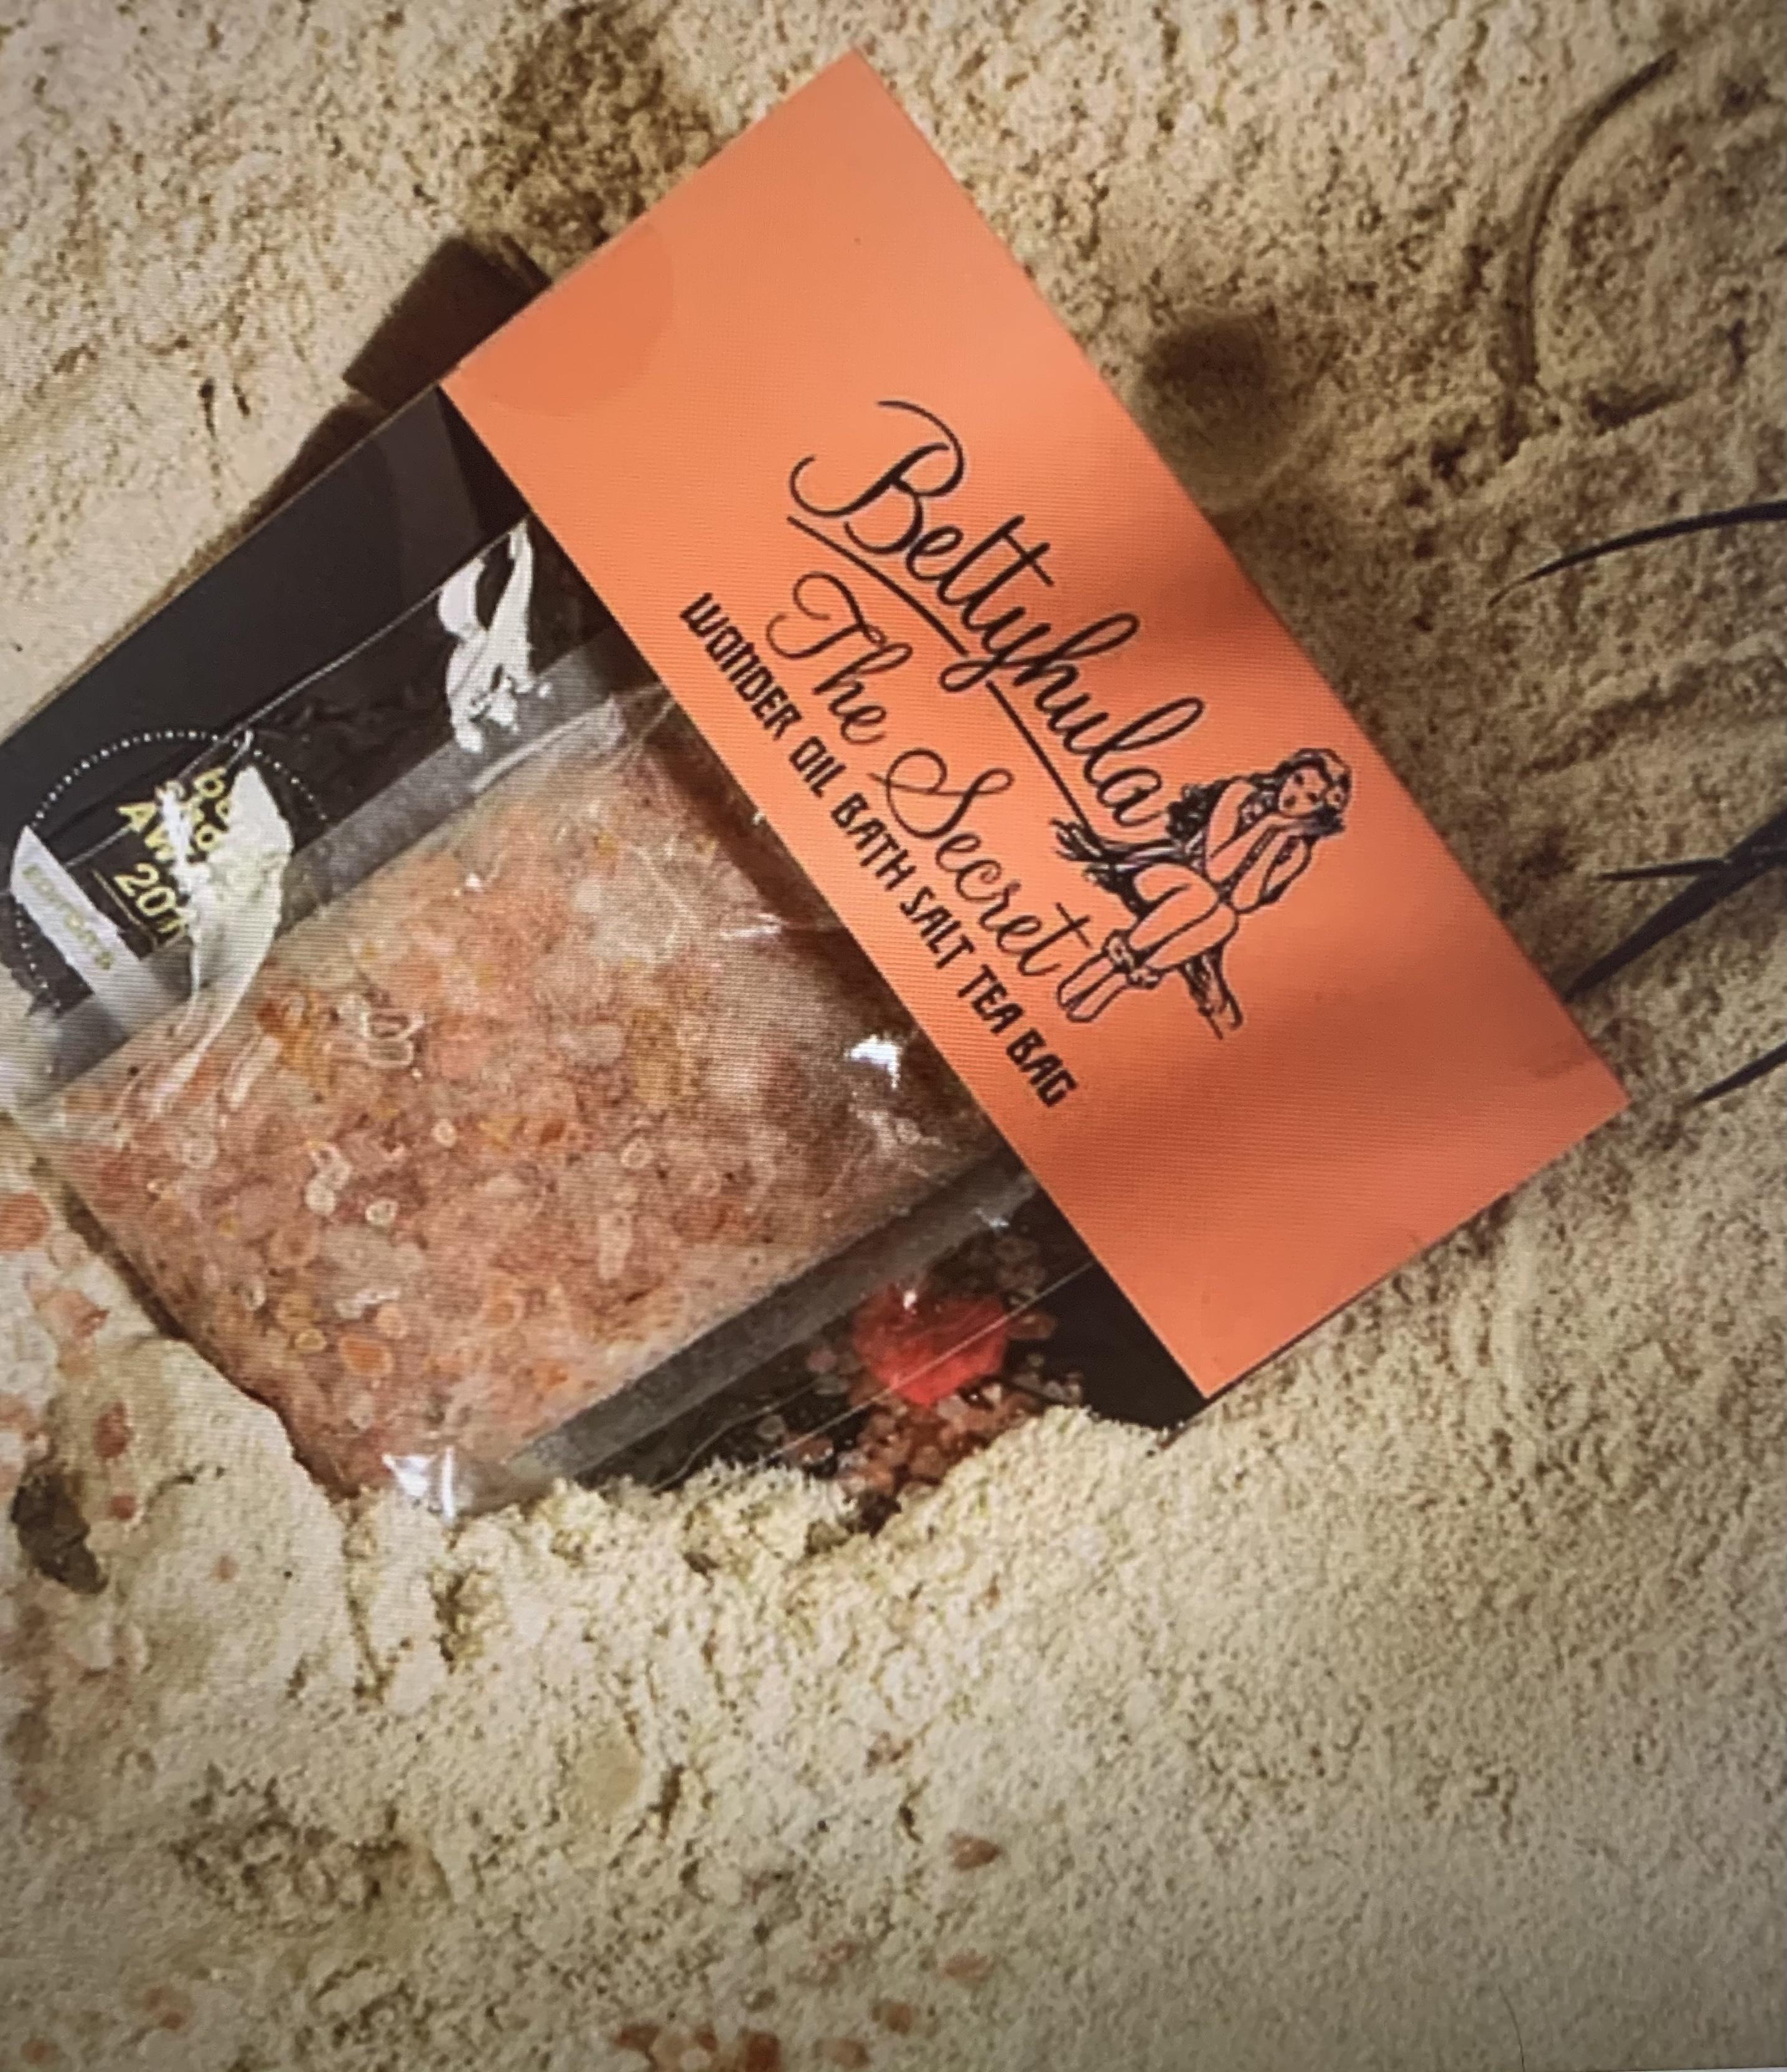 Betty Hula The Secret Wonder Bath Oil Tea Bag 40g